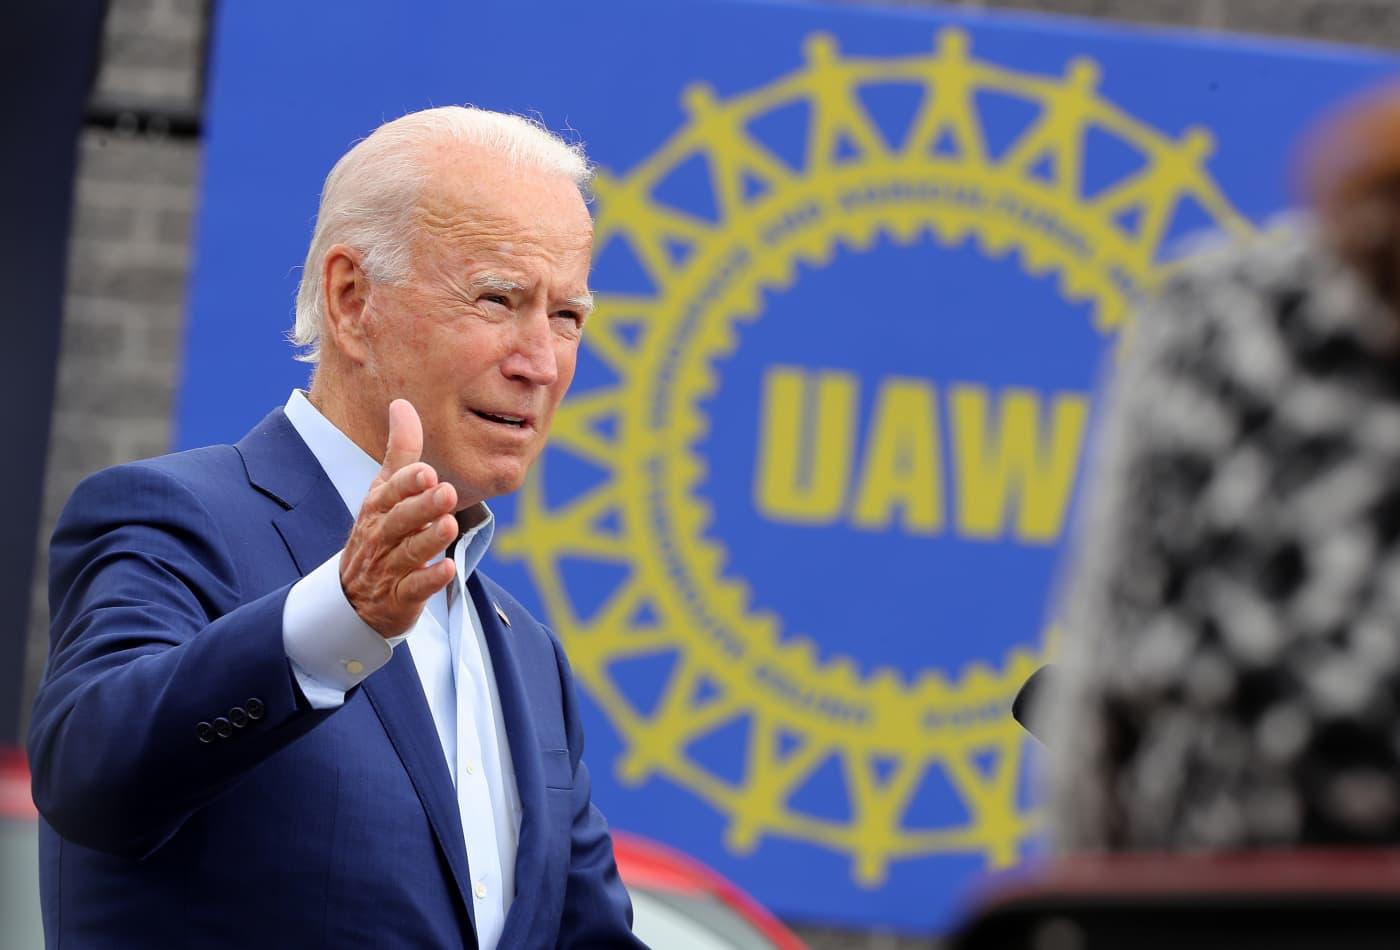 Wall Street Democrat: Biden's capital gains tax hike wouldn't deter long-term investors